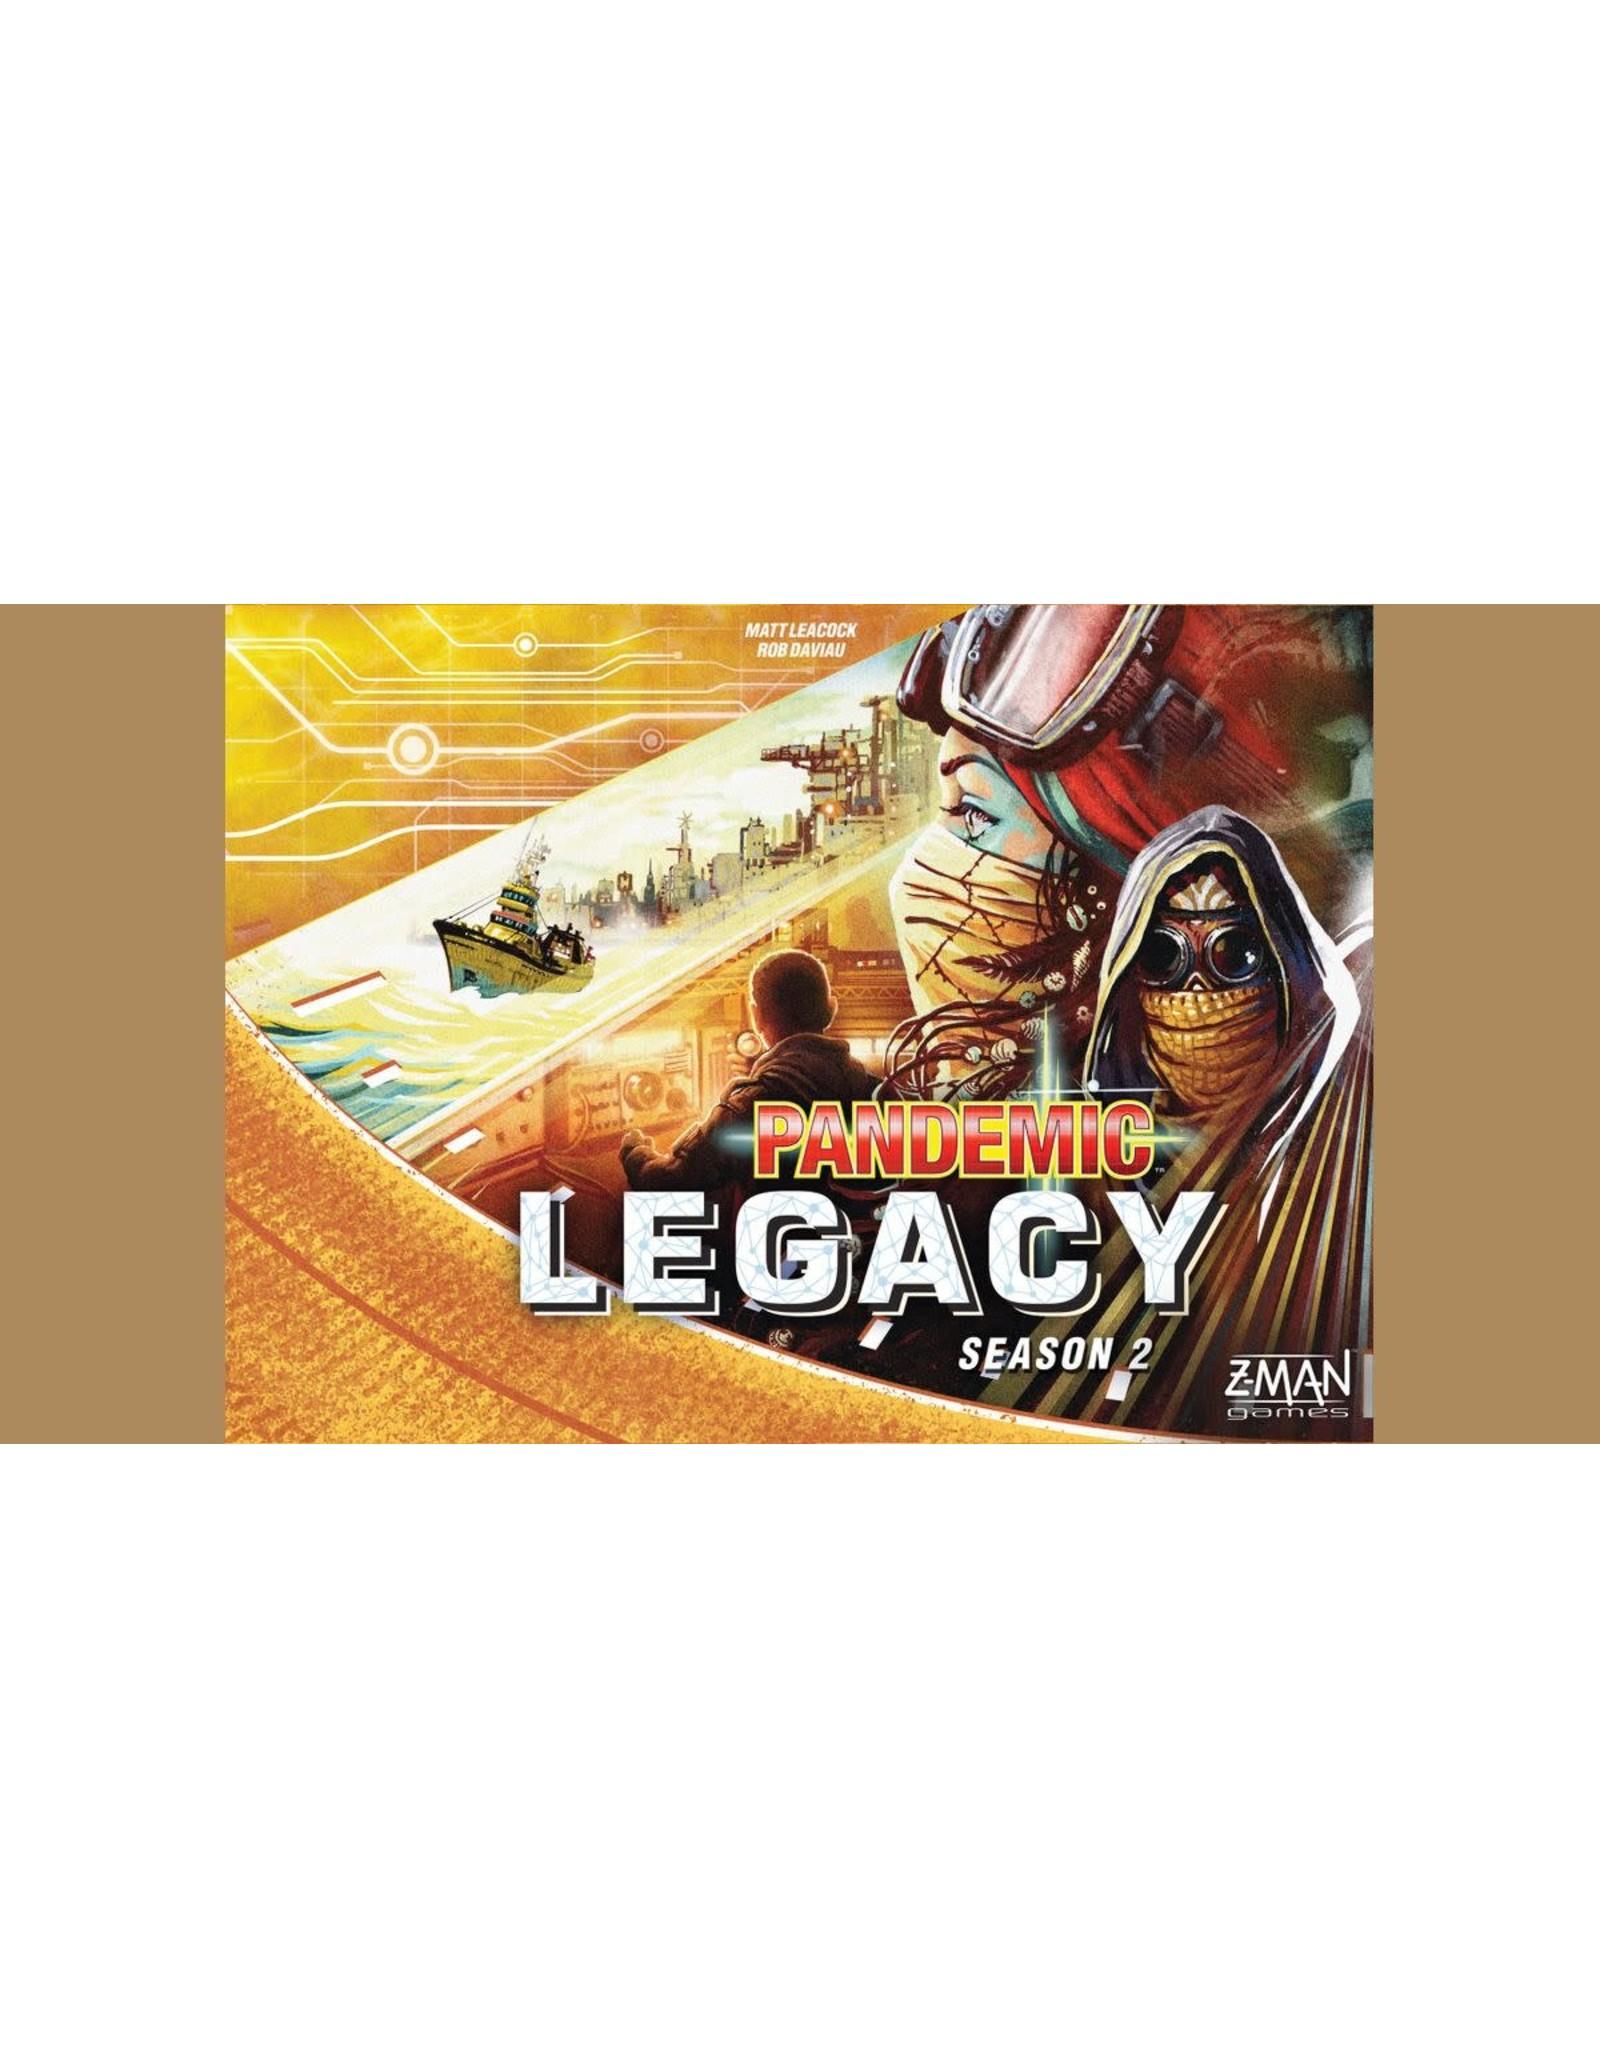 Pandemic Legacy Season 2 (Yellow Edition)